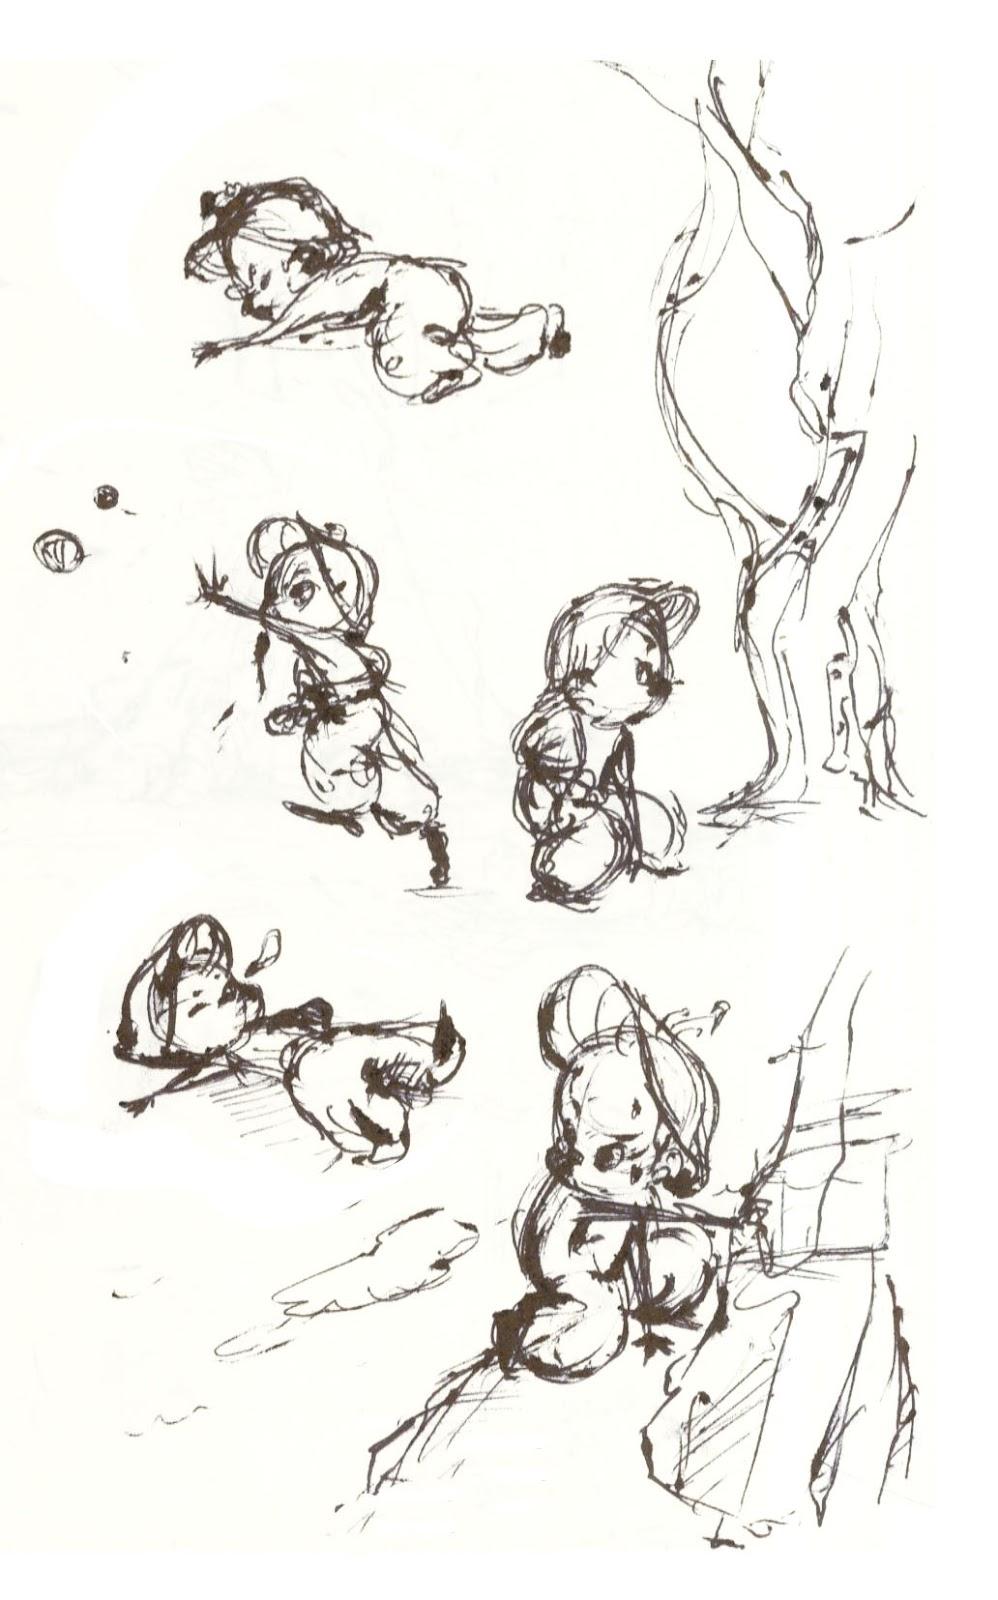 Calarts Character Design Portfolio : Takehiro nishikawa portfolio film progression character